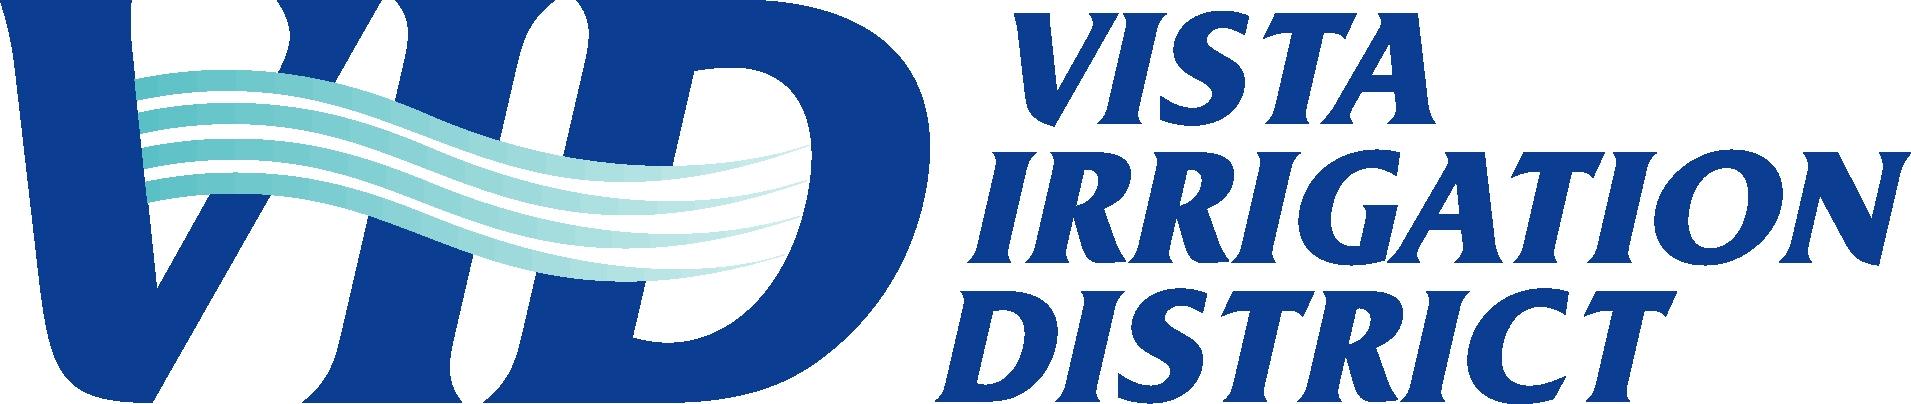 Vista Irrigation District logo